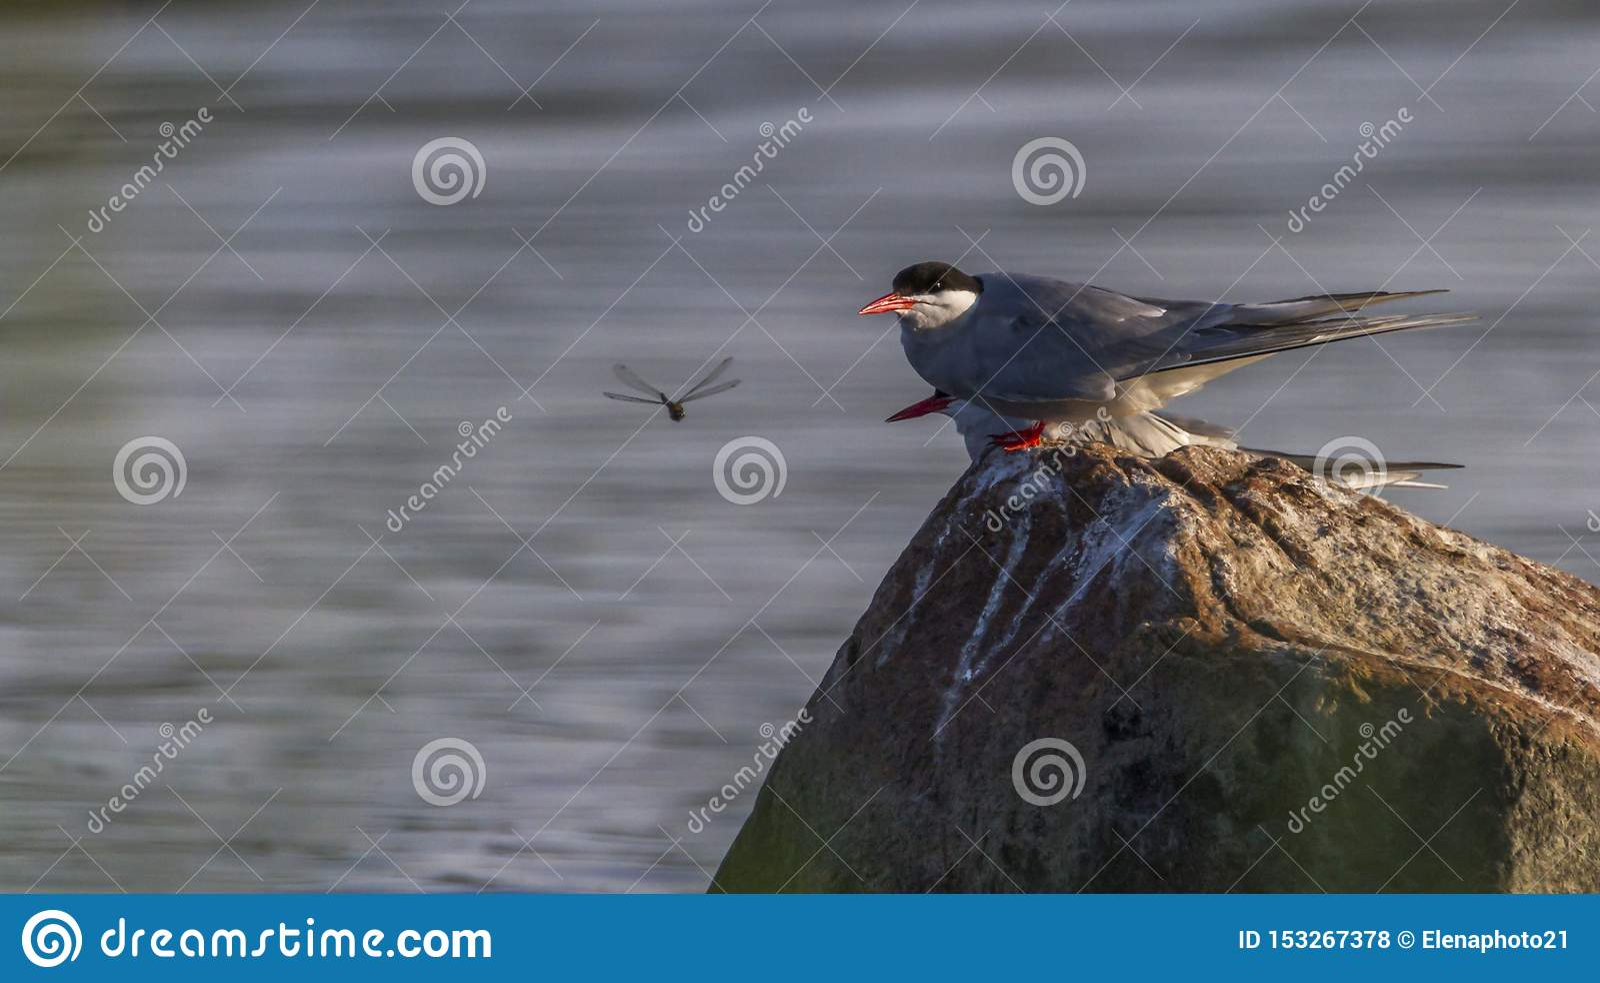 Breeding Adult Common Terns, Sterna hirundo, Kalmar, Sweden